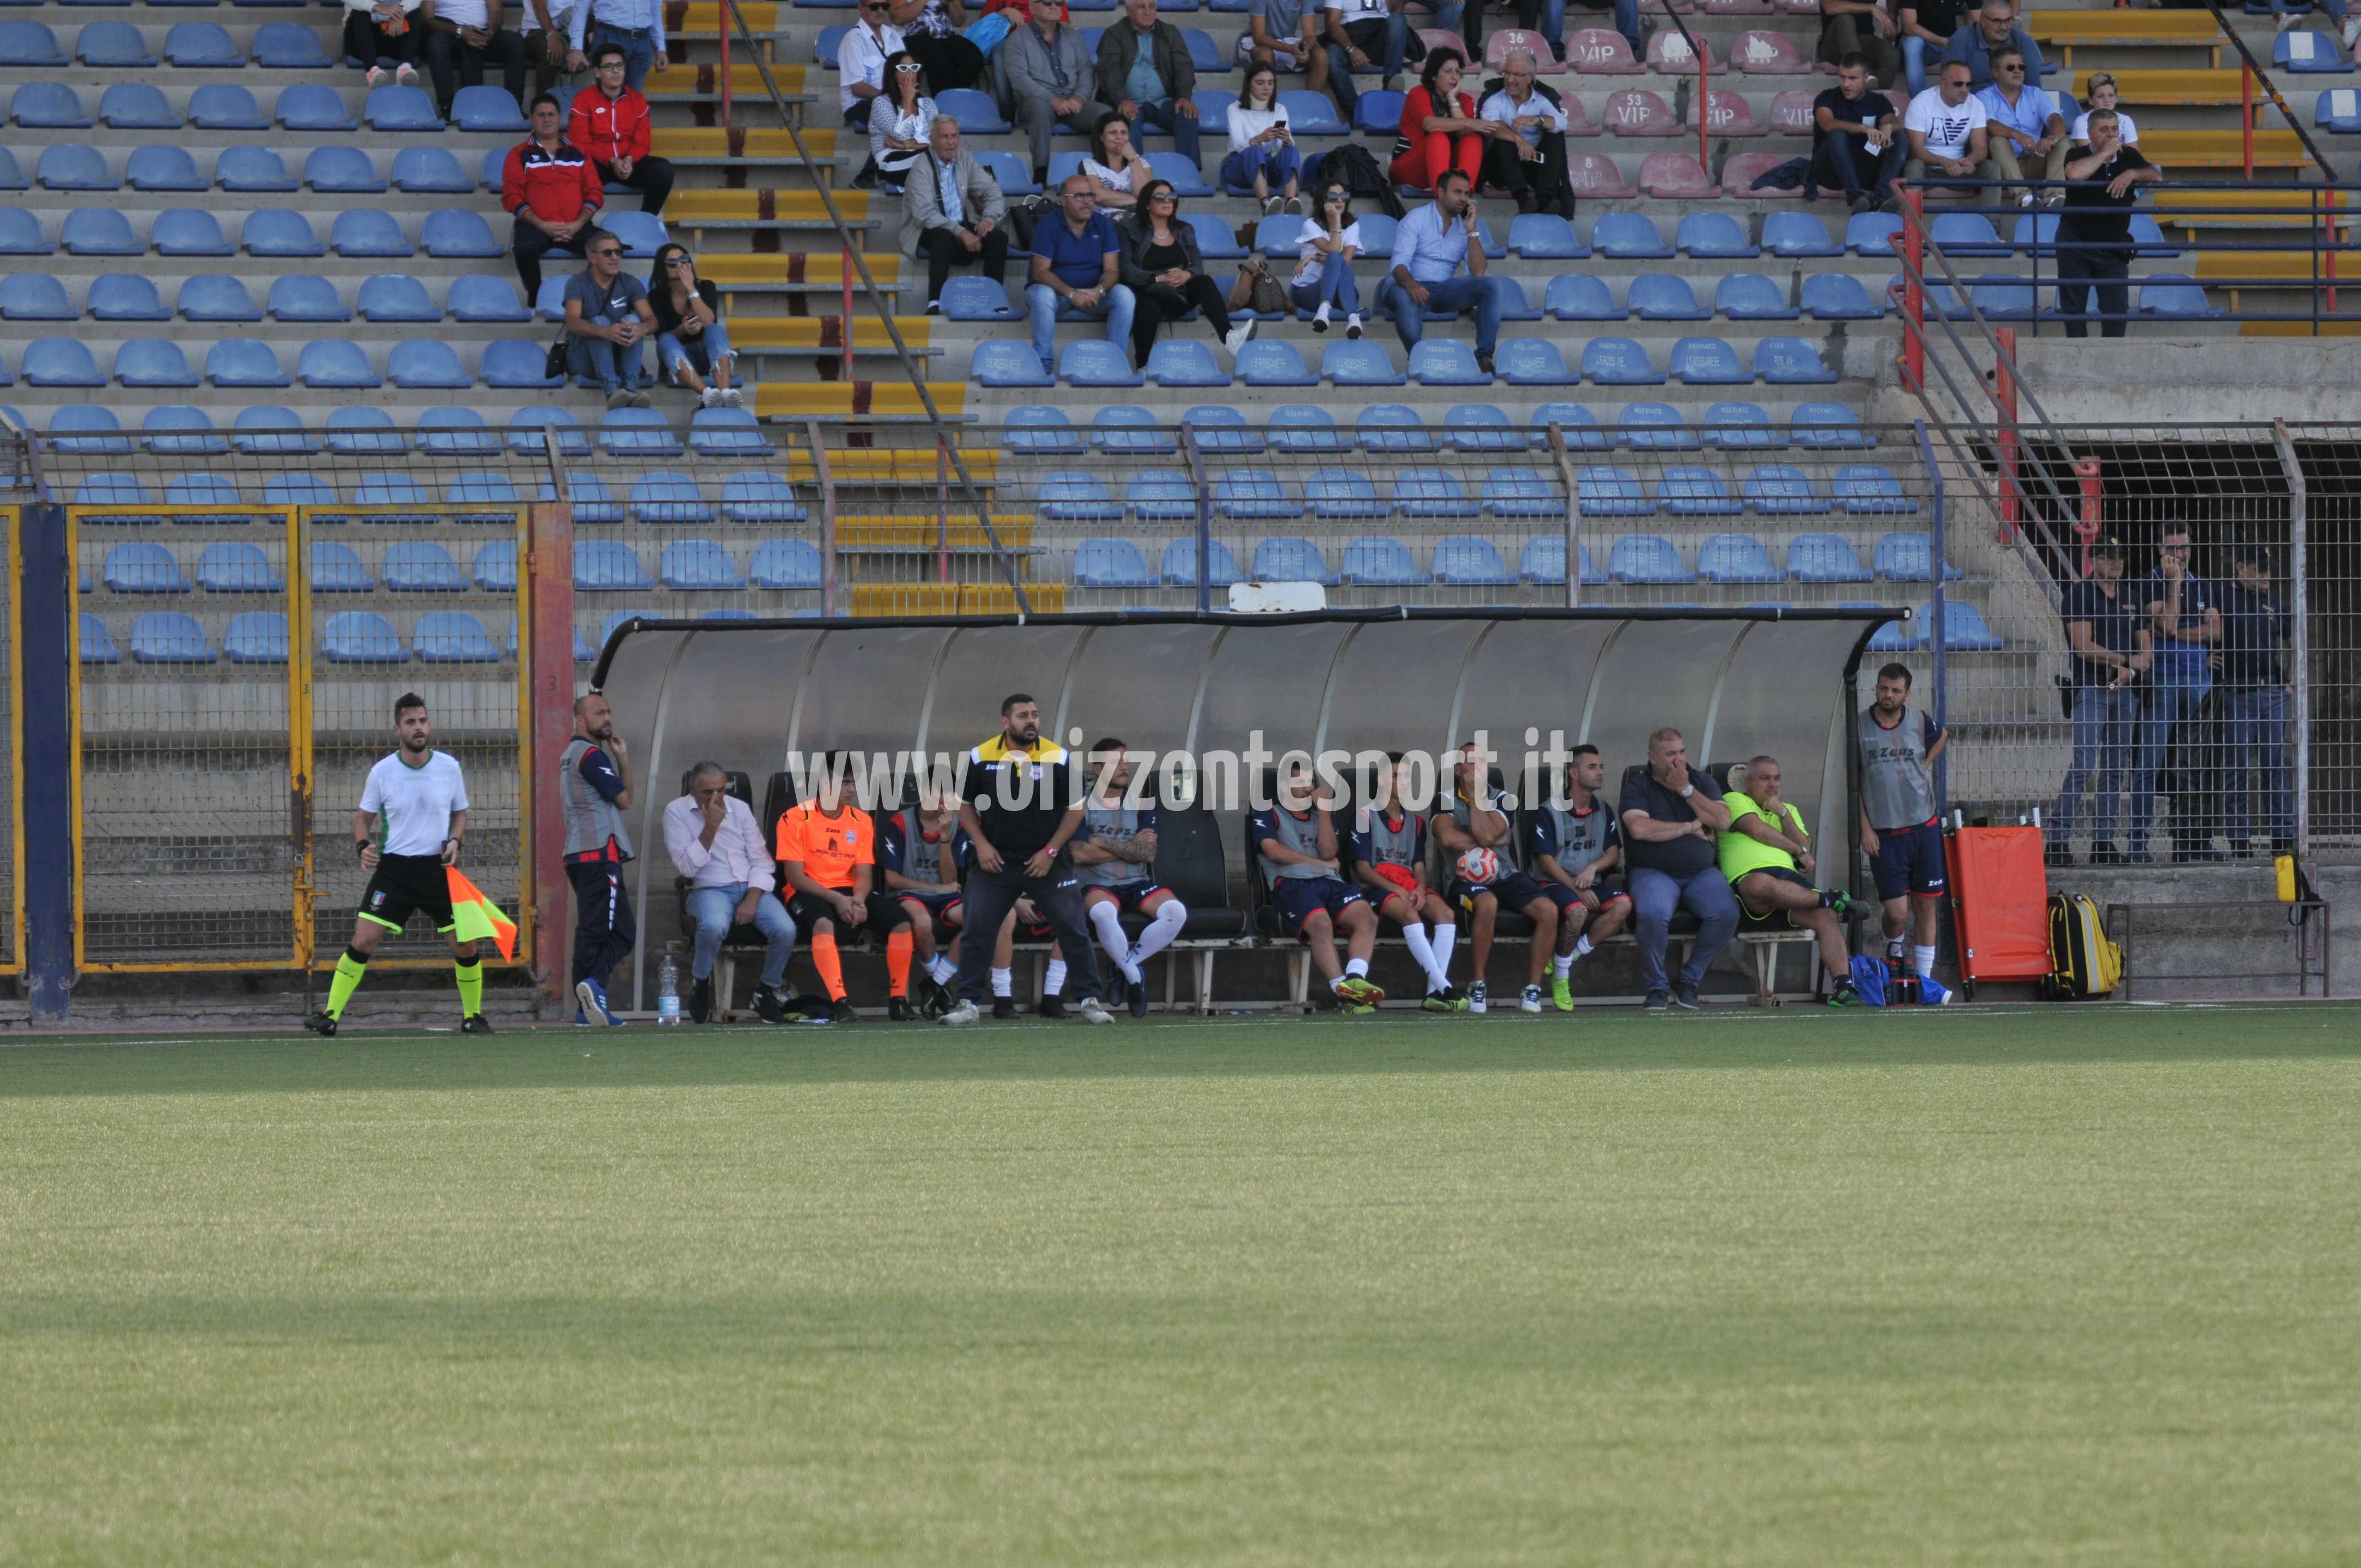 rossanese_praiatrtora_cpppa_italia (54)